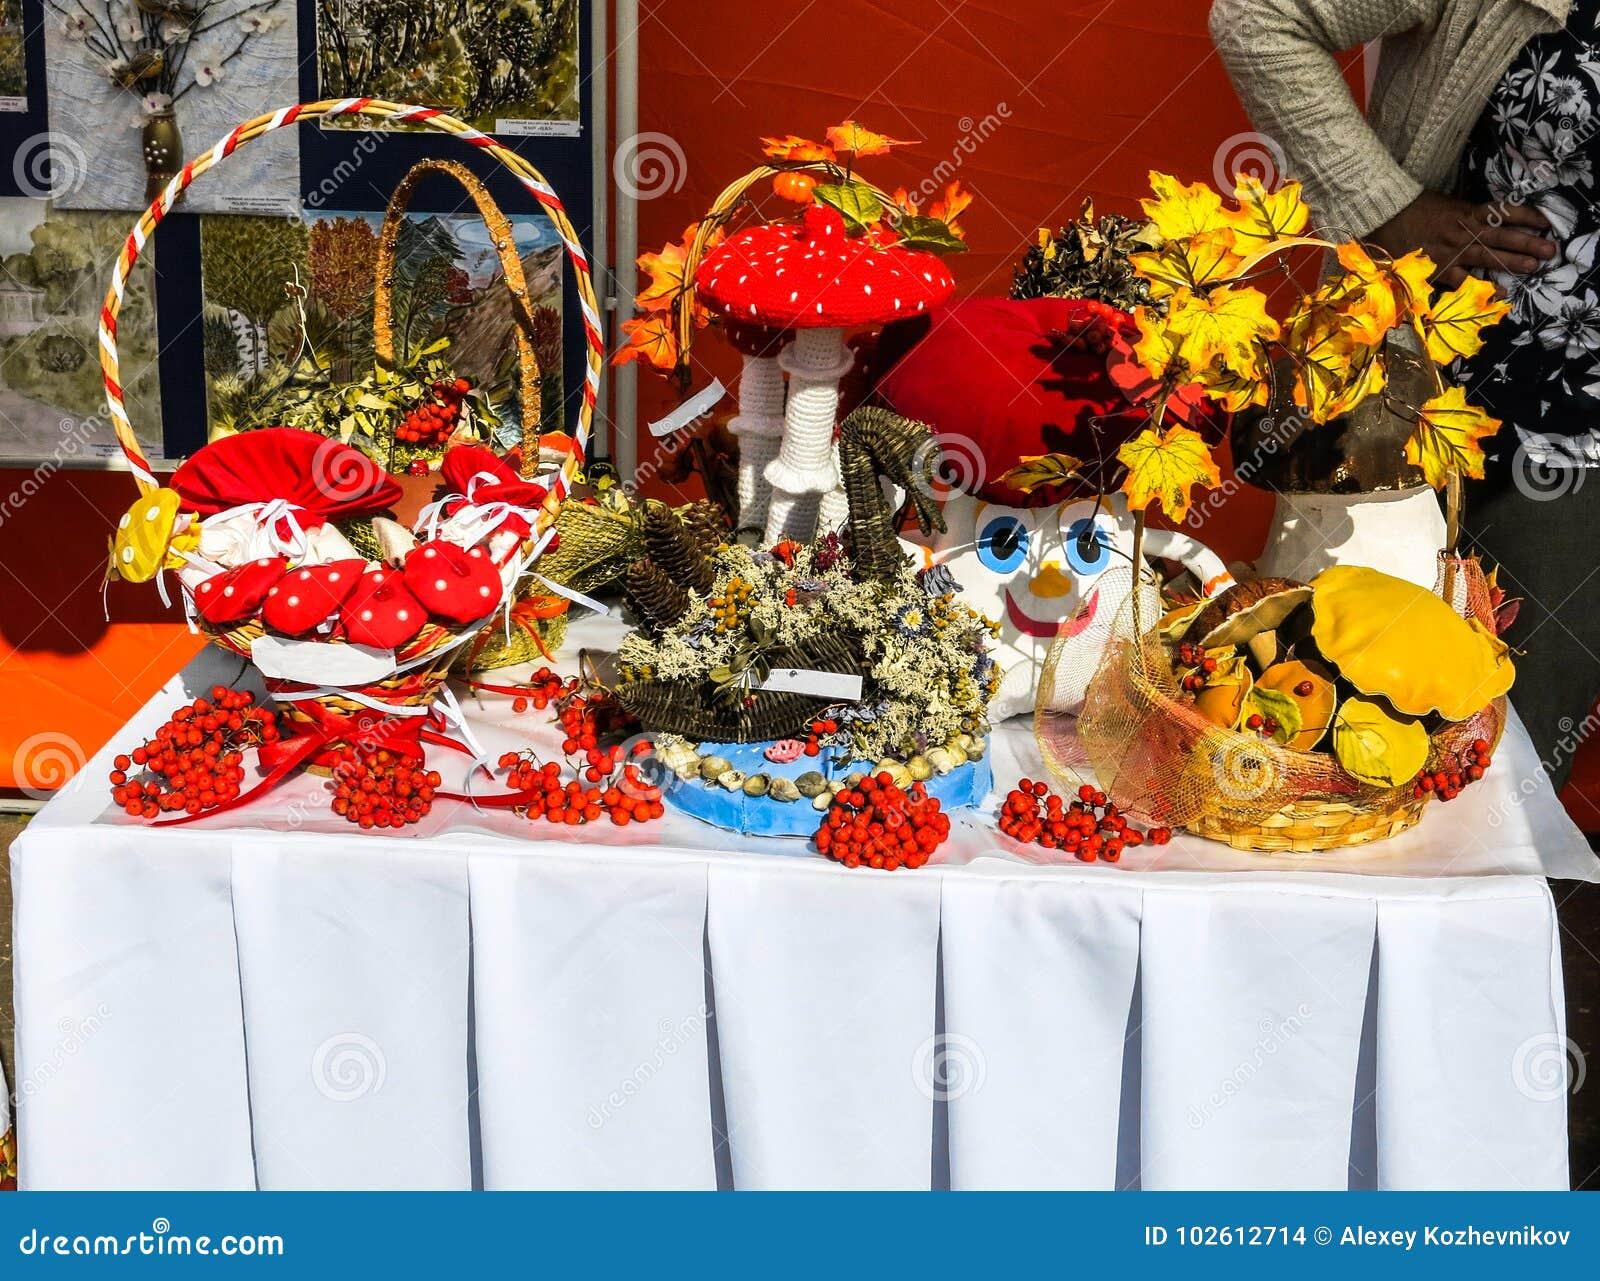 Homemade decorative crafts